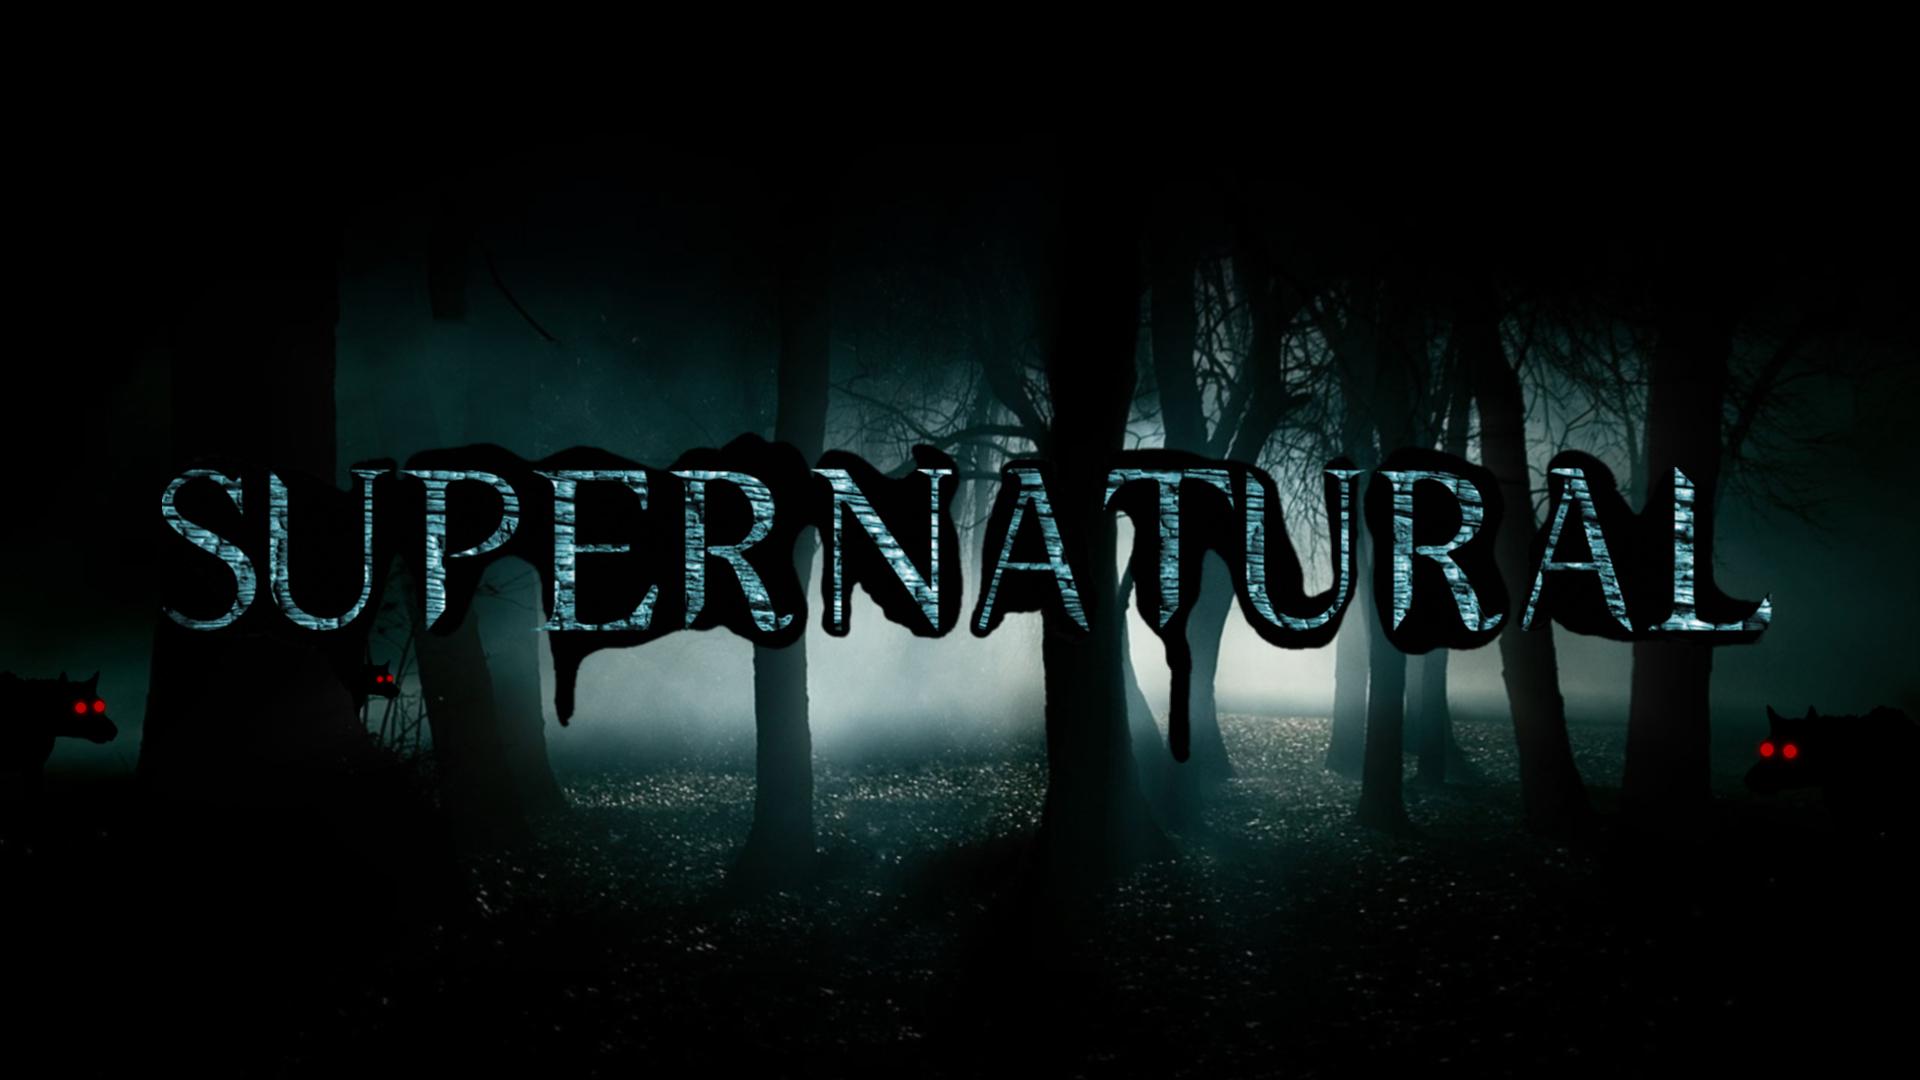 Top Wallpaper Logo Supernatural - supernatural-maria560-39560536-1920-1080  Image_1002953.png